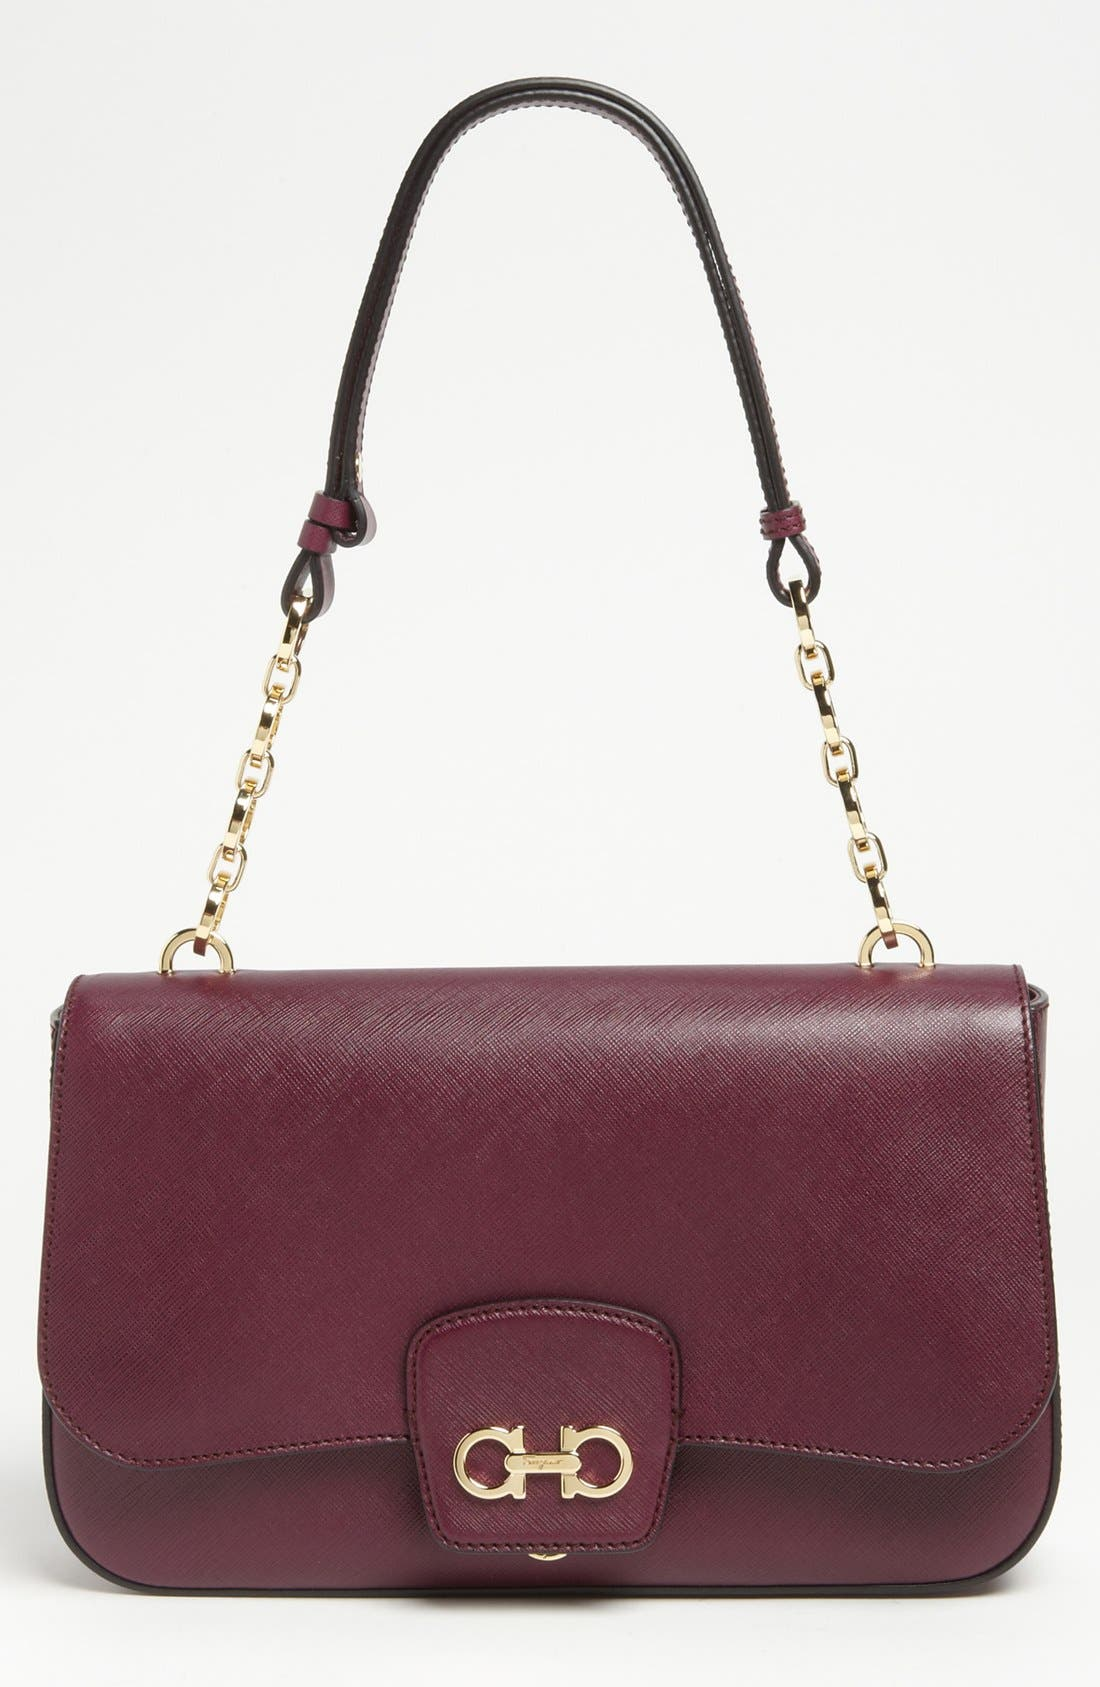 Main Image - Salvatore Ferragamo 'Bree' Leather Shoulder Bag